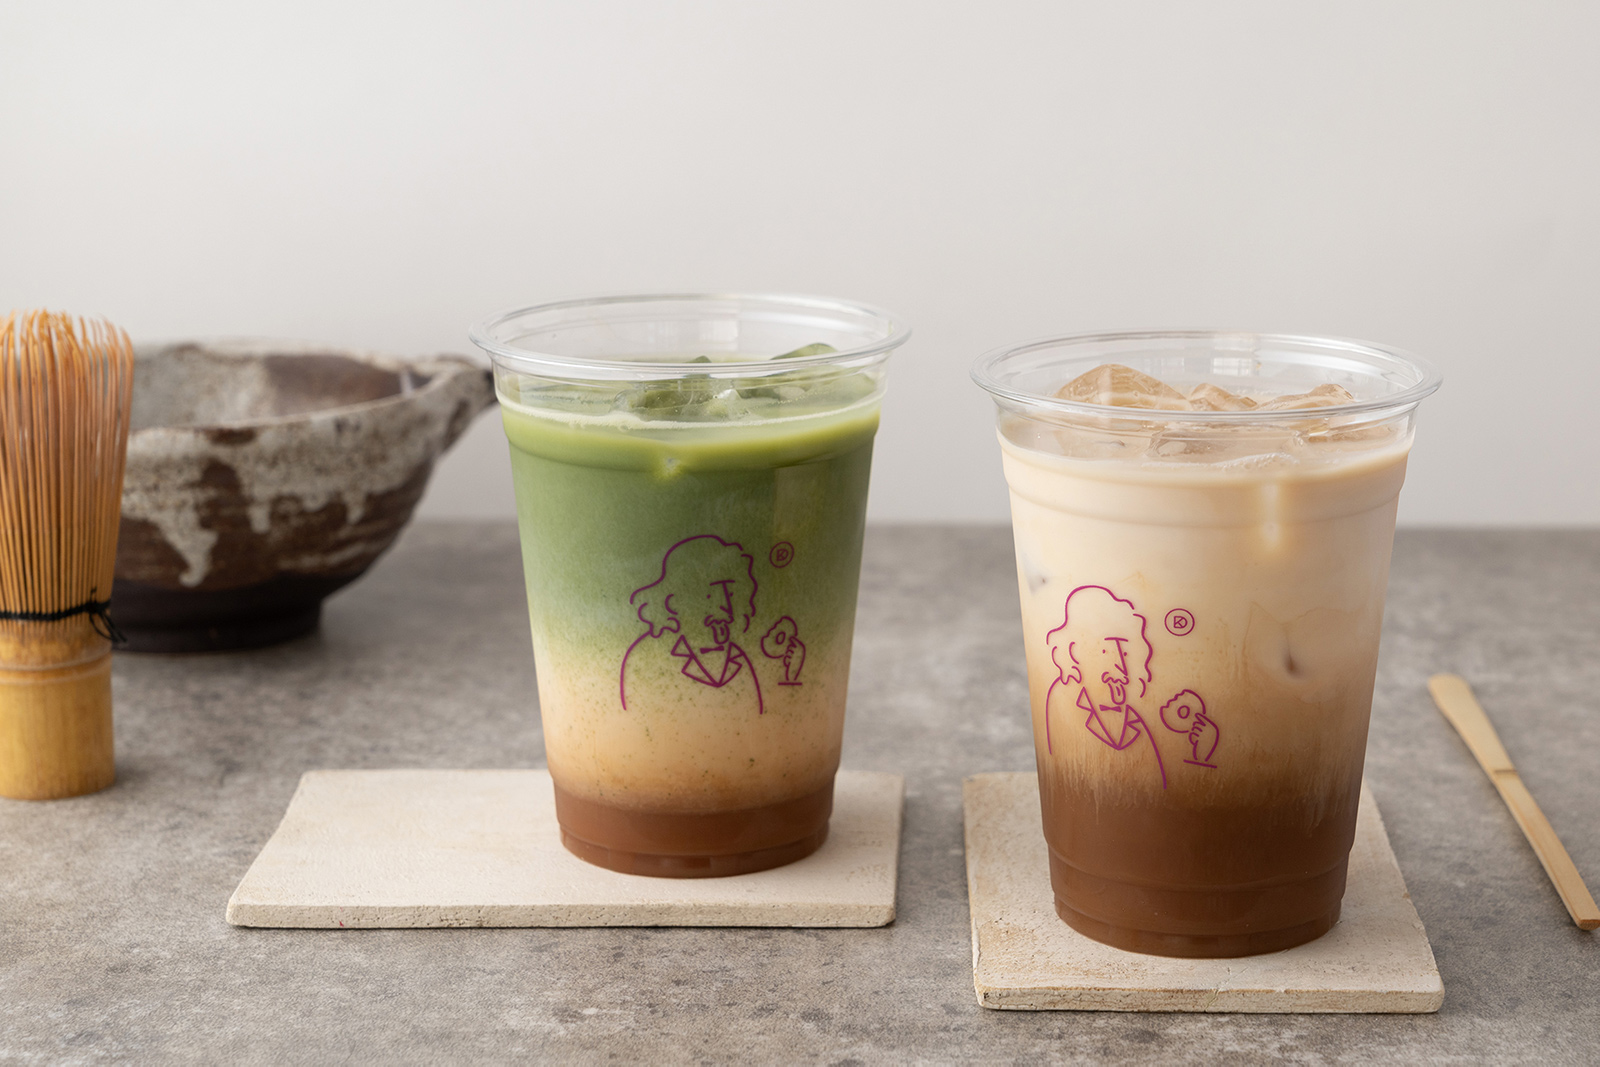 koe donuts kyoto × MILK TEA SERVICE × YUGEN のトリプルコラボ! 日本茶とミルクティーの融合を楽しんで